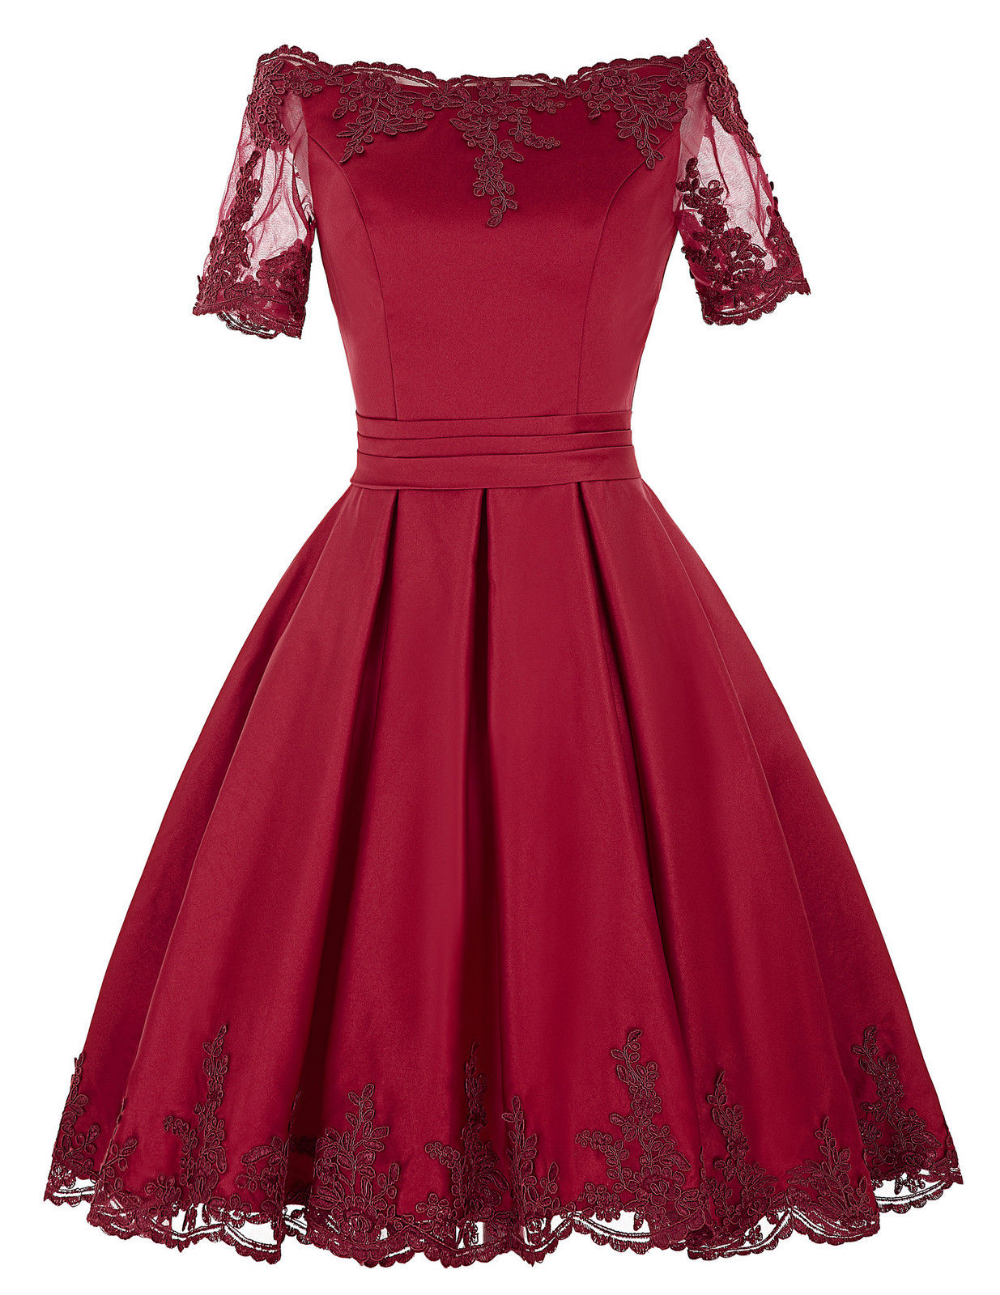 Short Sleeve Lace Applique Fashion Short Prom Dress Bridesmaid Dress Evening Party Dress Long Sleeve Dress Formal Satin Homecoming Dress Dresses Formal Elegant [ 1295 x 1000 Pixel ]